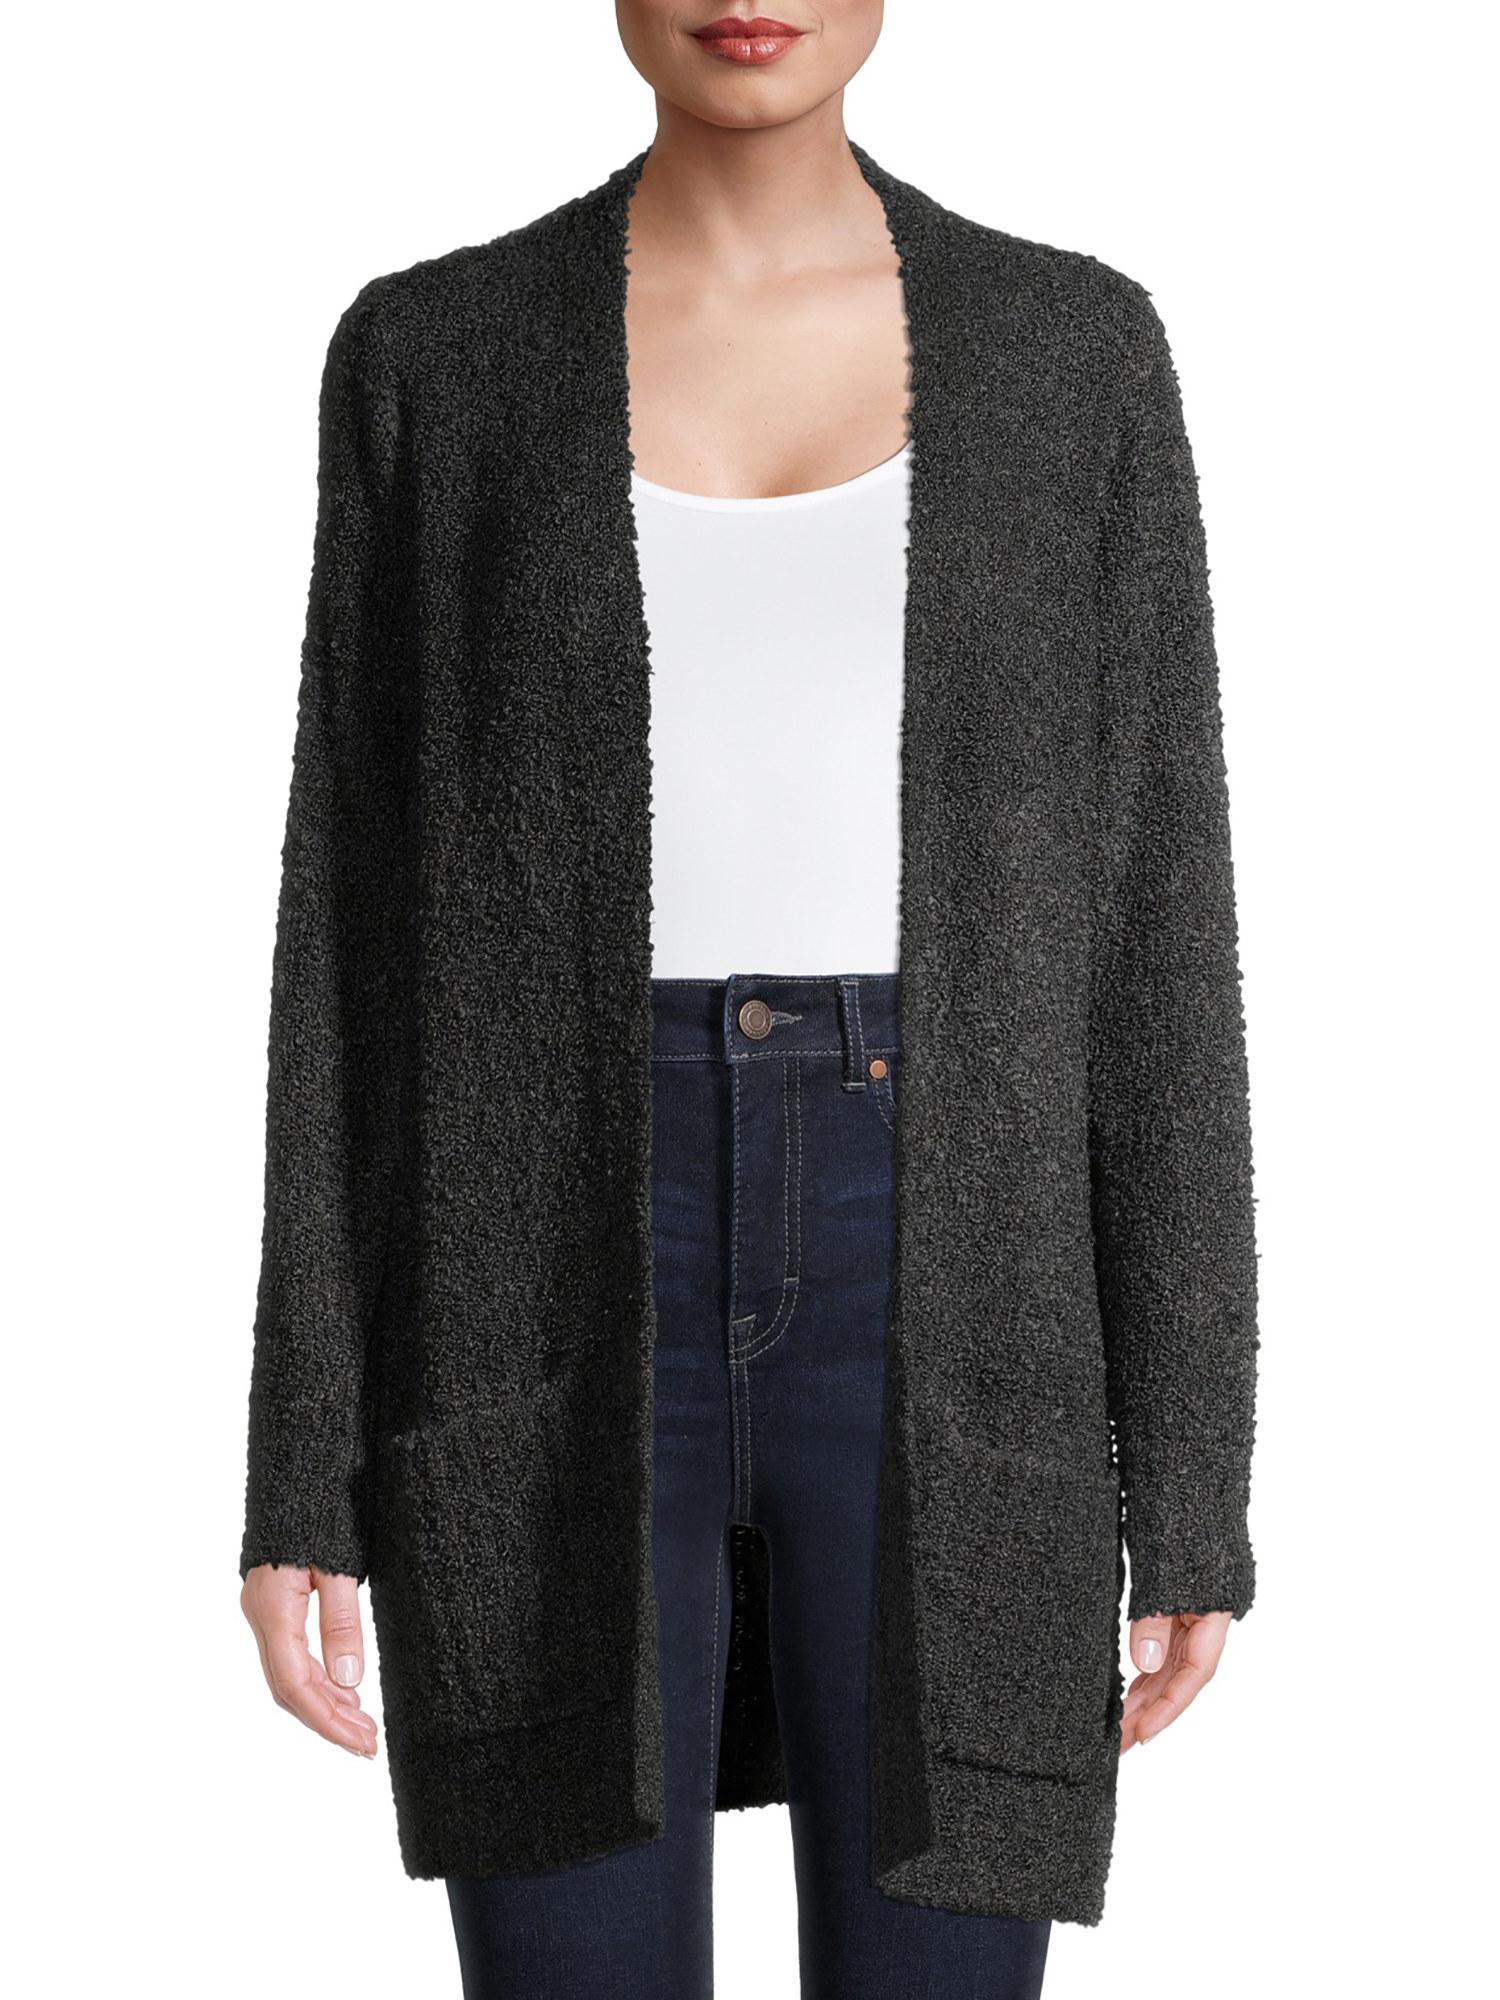 model in dark gray long open cardigan with pockets